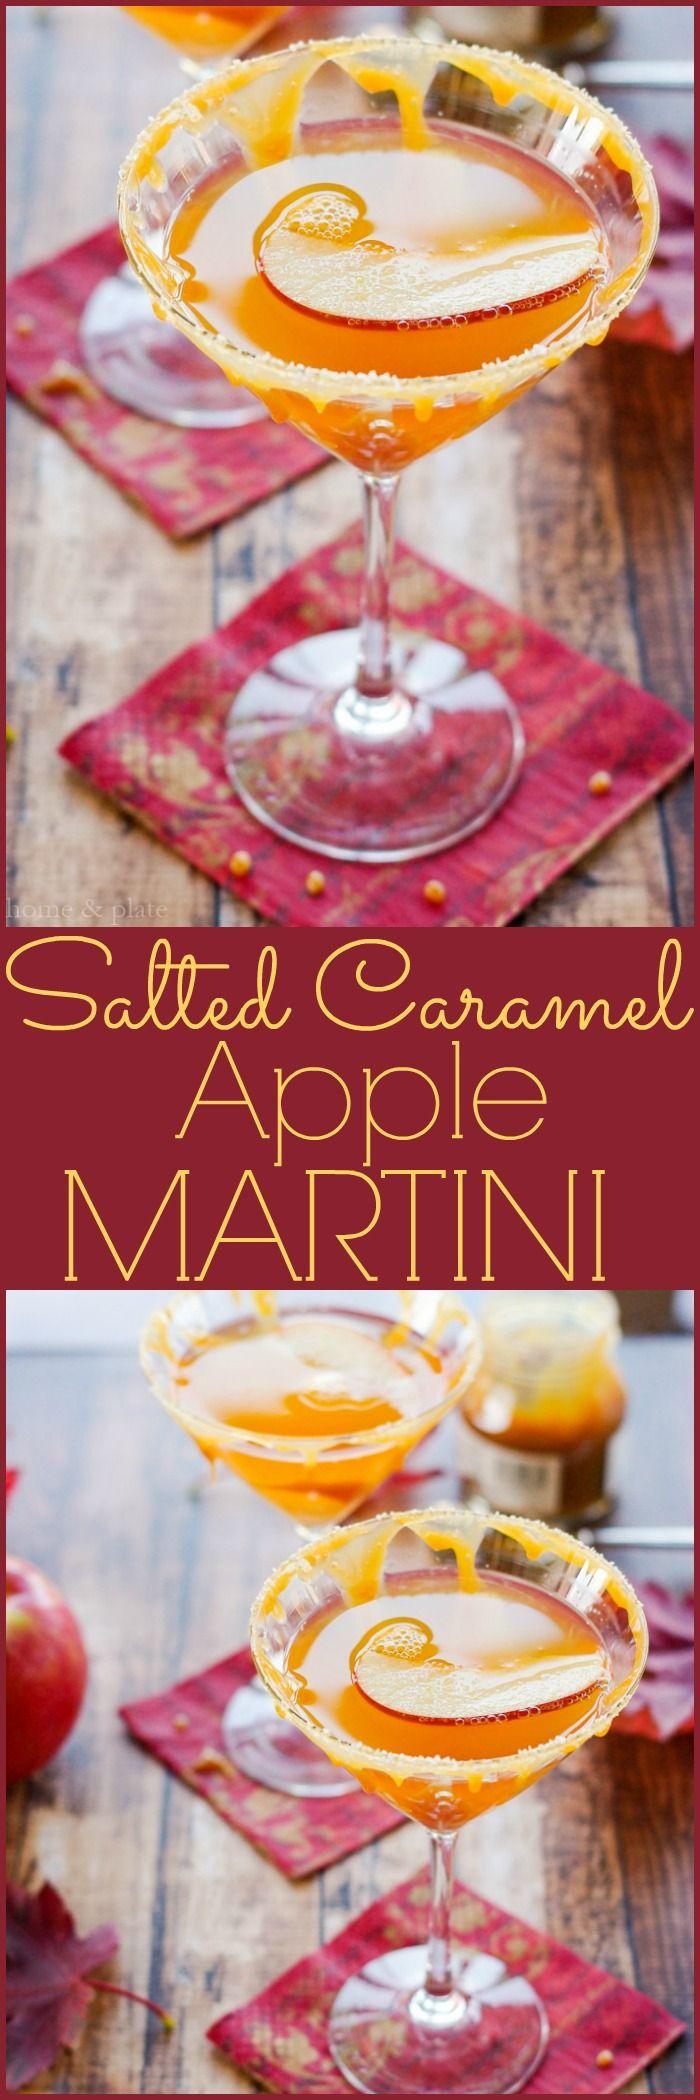 Caramel Apple Martini Cocktail Recipe - Home & Plate